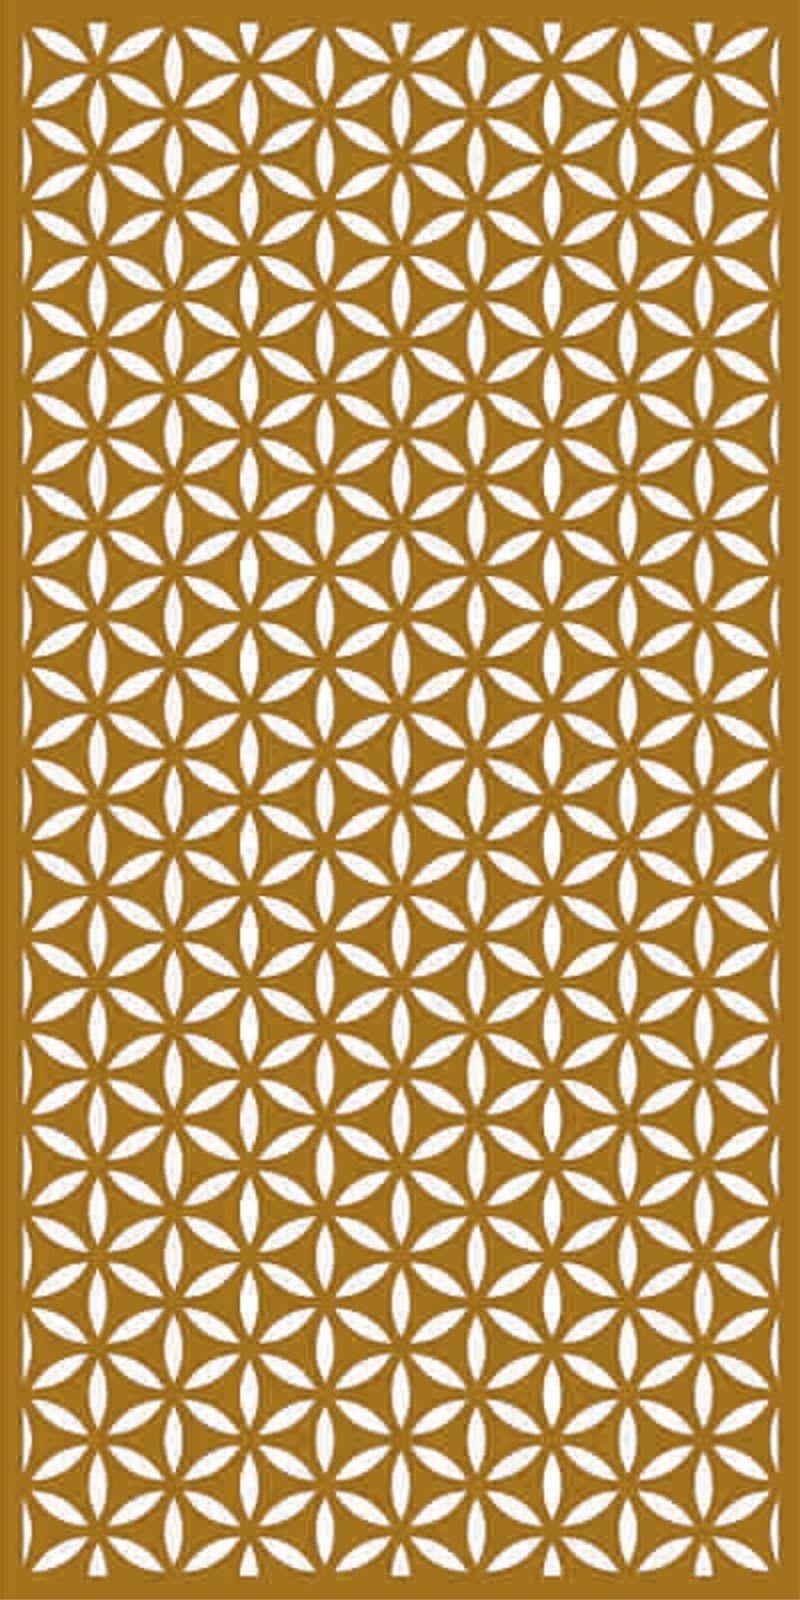 Katalog 2d Panel Design A Kreatif Desain Ukiran